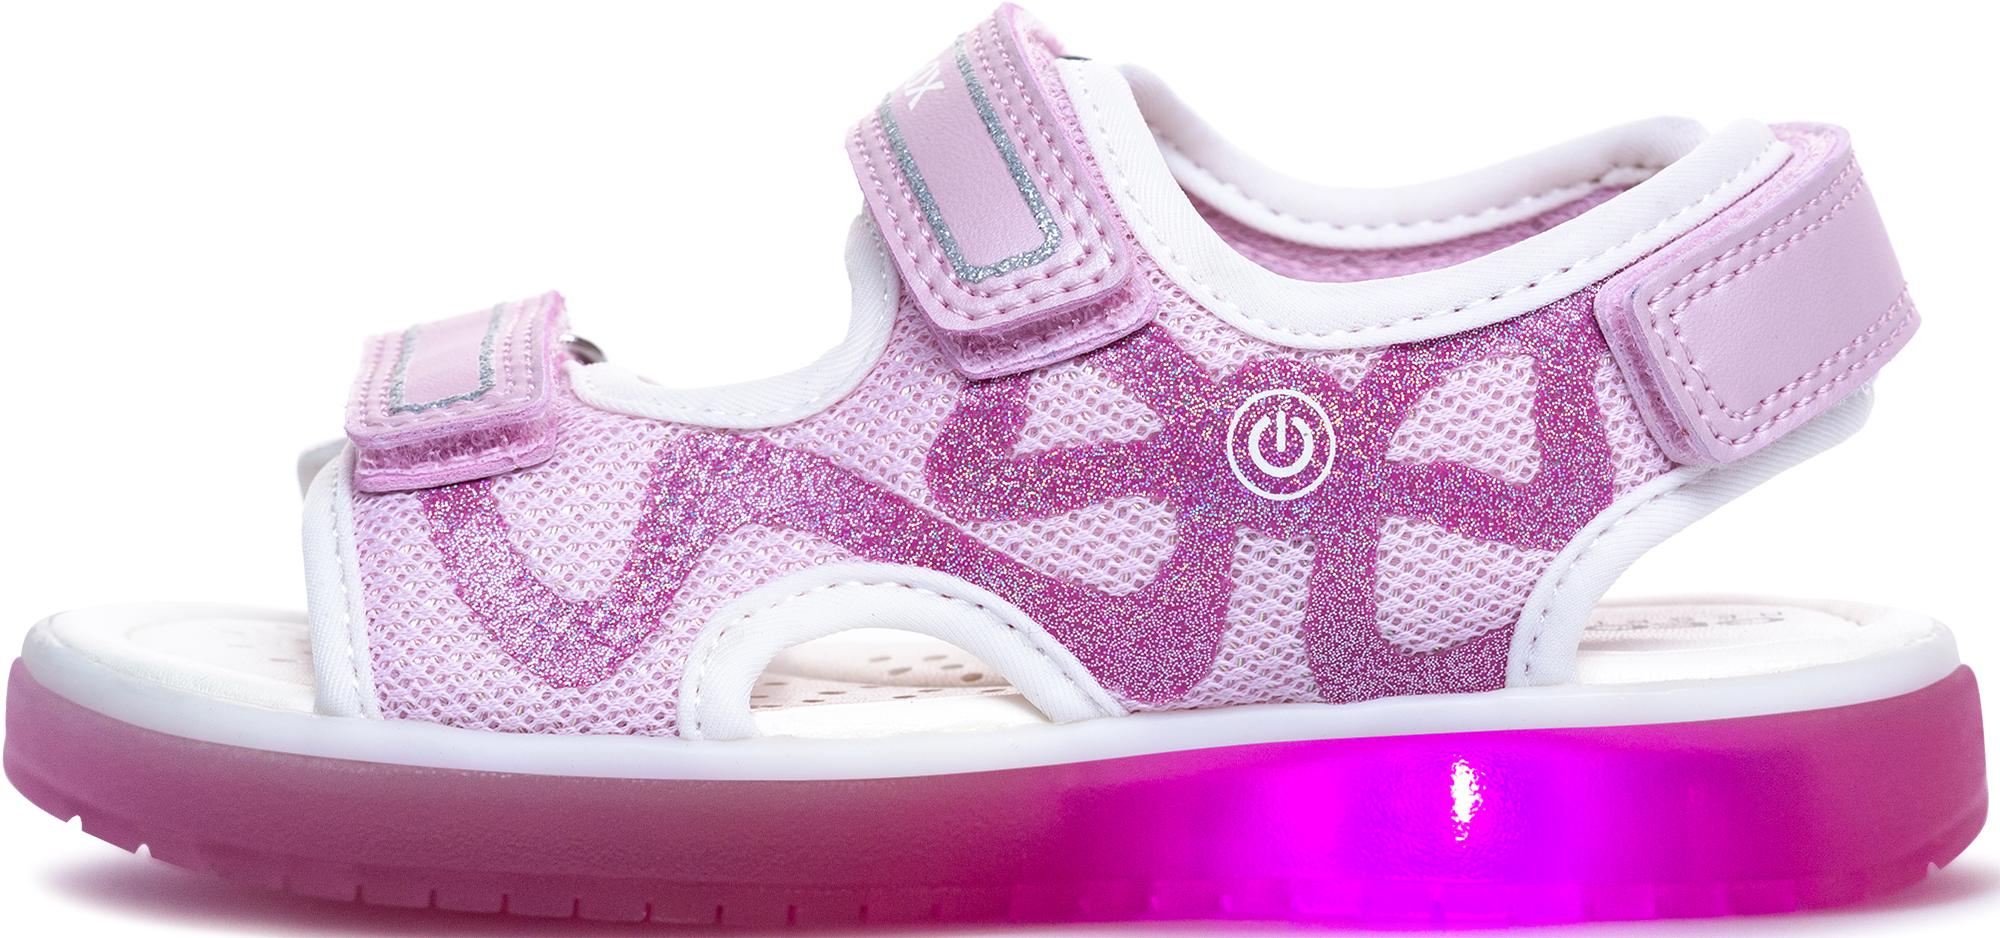 Geox Сандалии для девочек Geox Blikk, размер 34 geox сандалии для мальчика geox